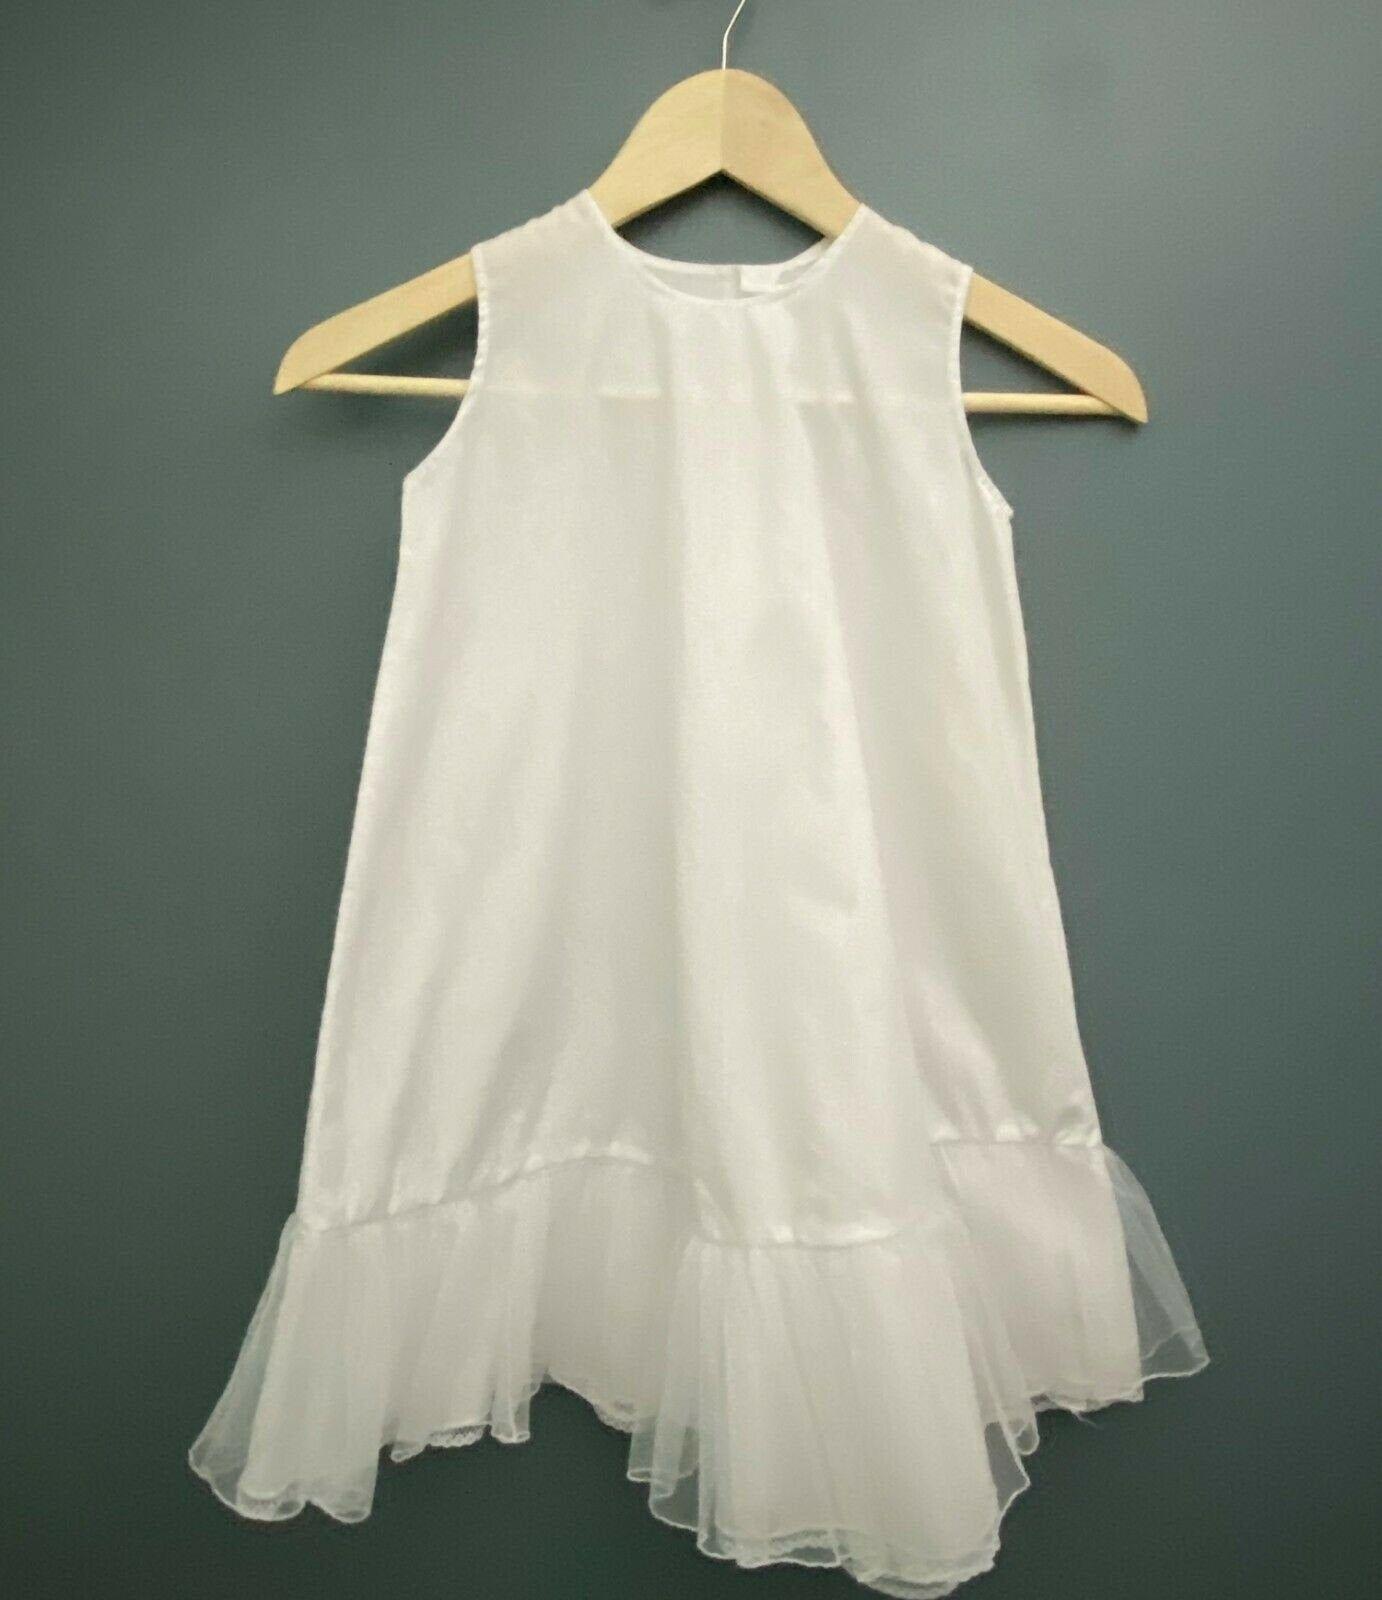 Vintage Girls Toddler White Dress Slip Ruffles 3t 4t Vintage Vintagedress Vintageslip Dres Vintage Childrens Clothing Toddler White Dress Childrens Clothes [ 1600 x 1382 Pixel ]